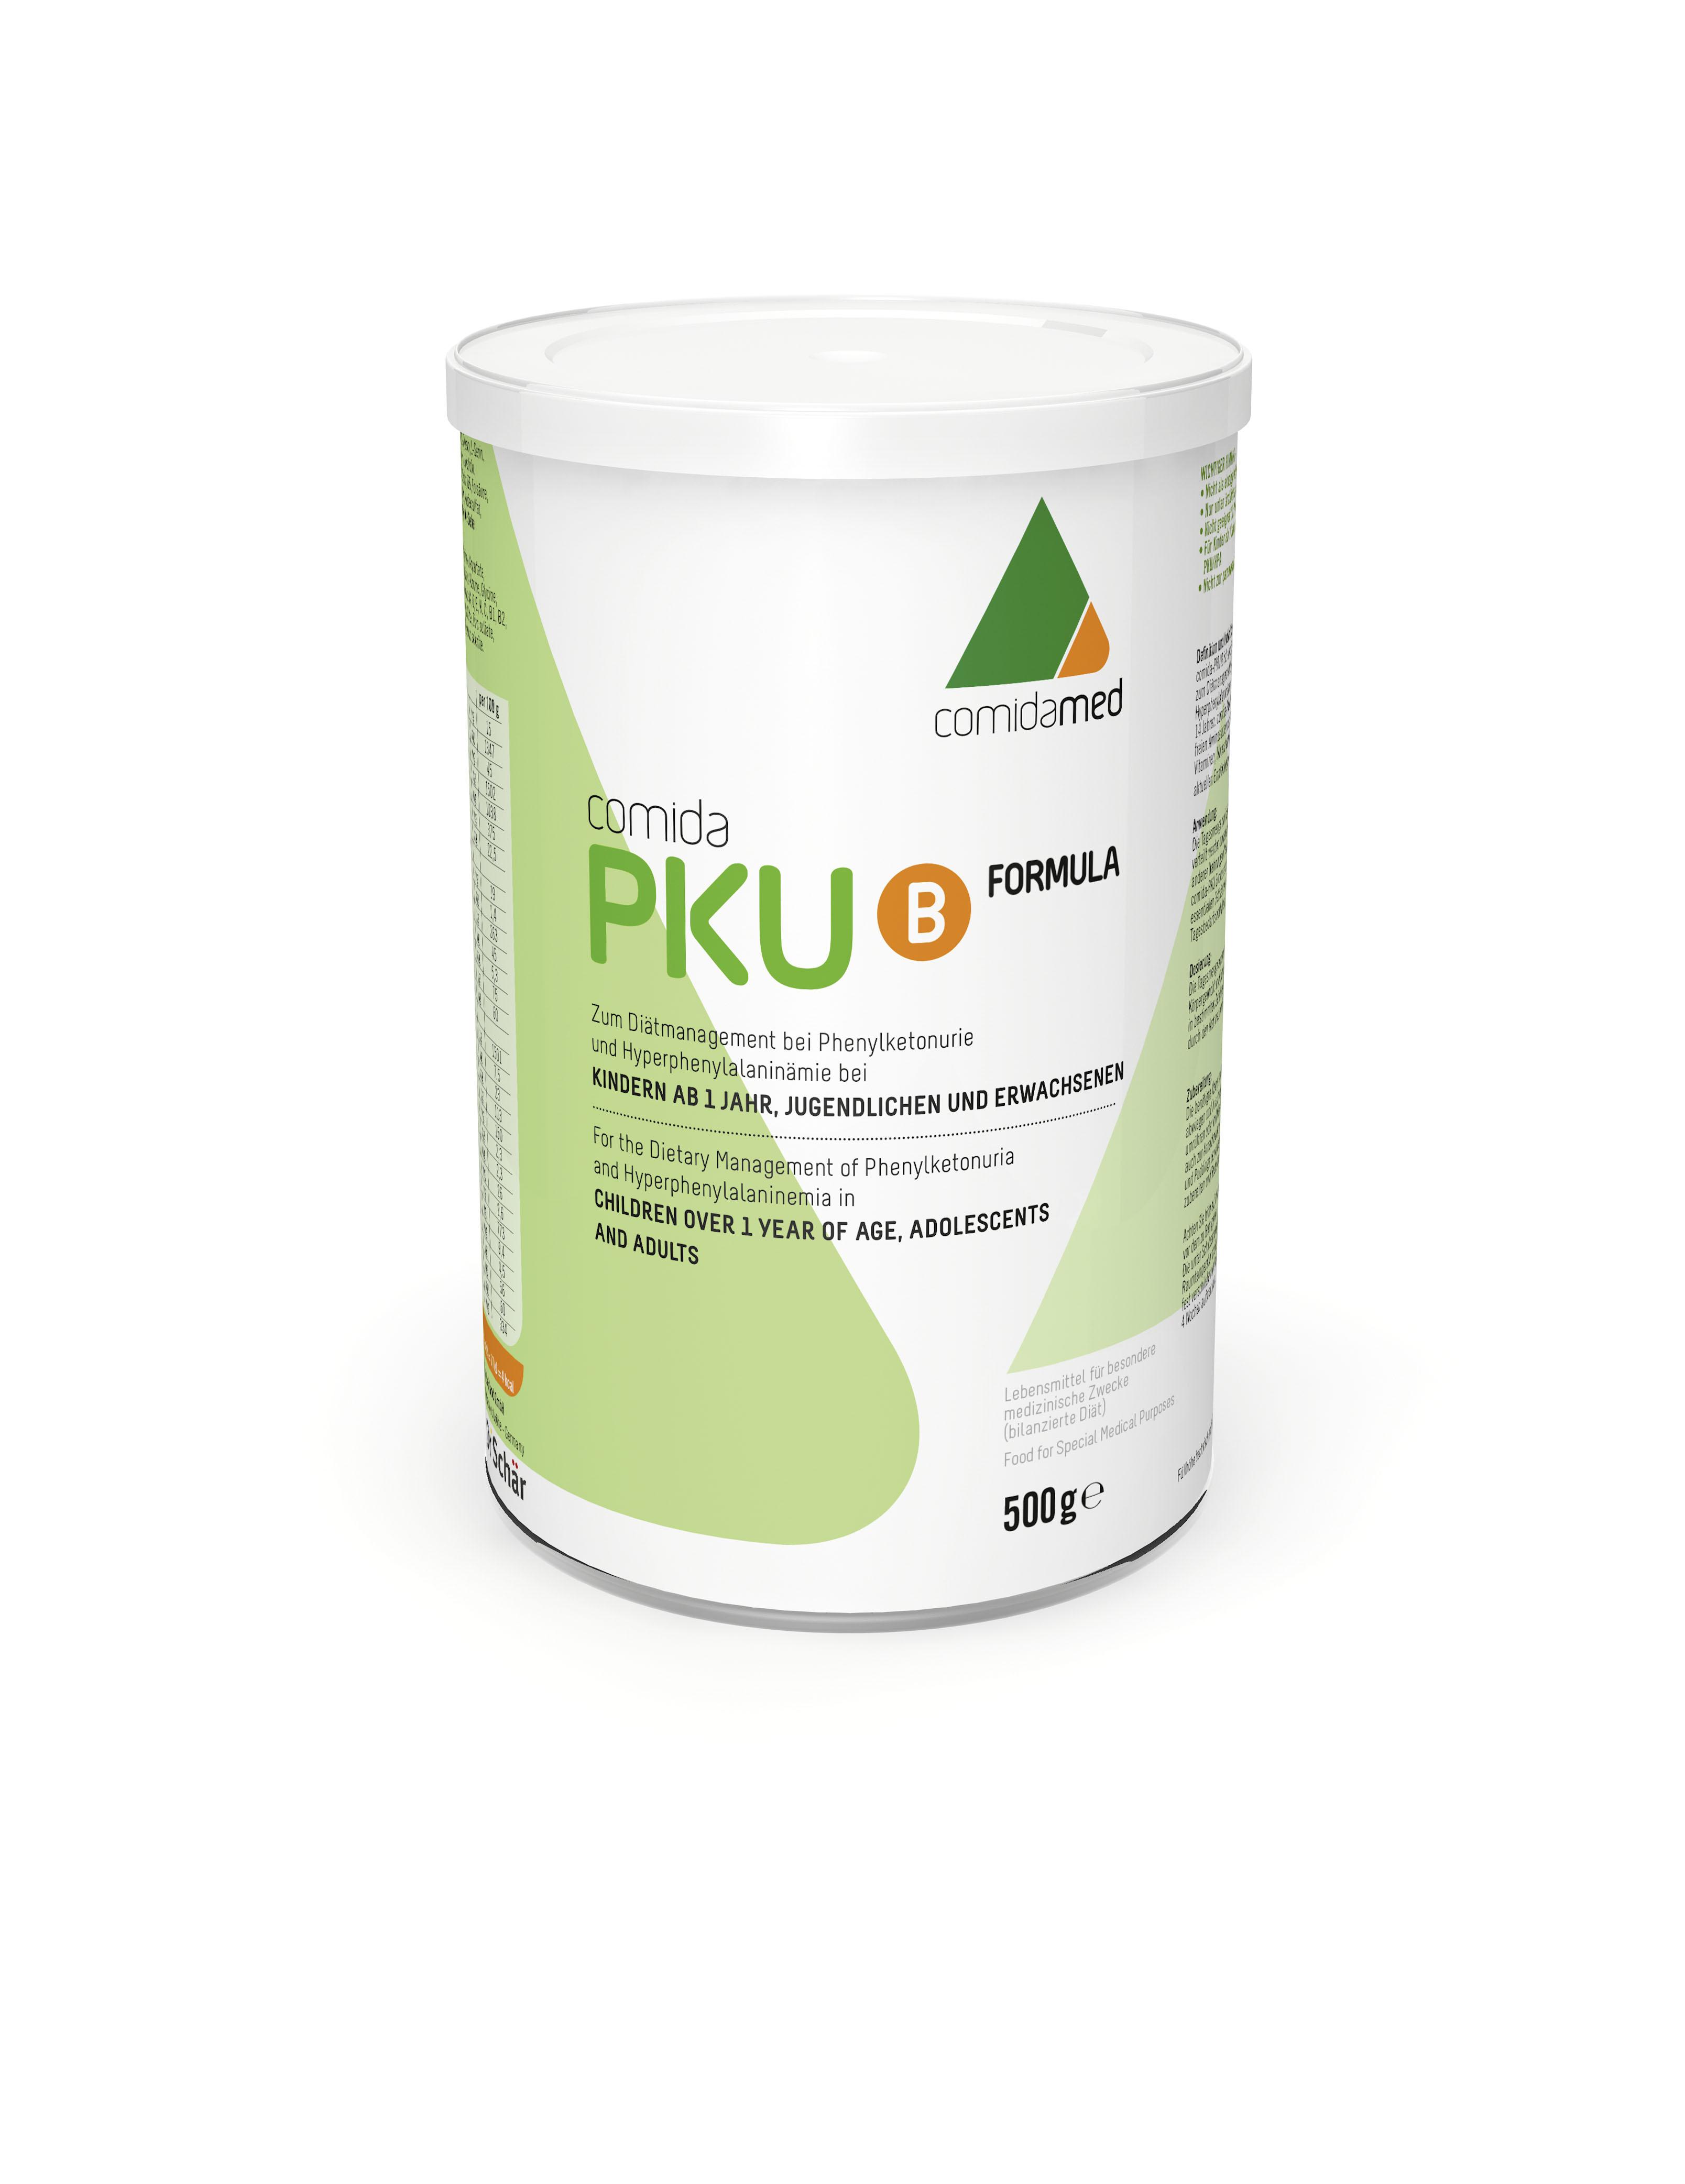 comida-PKU B FORMULA